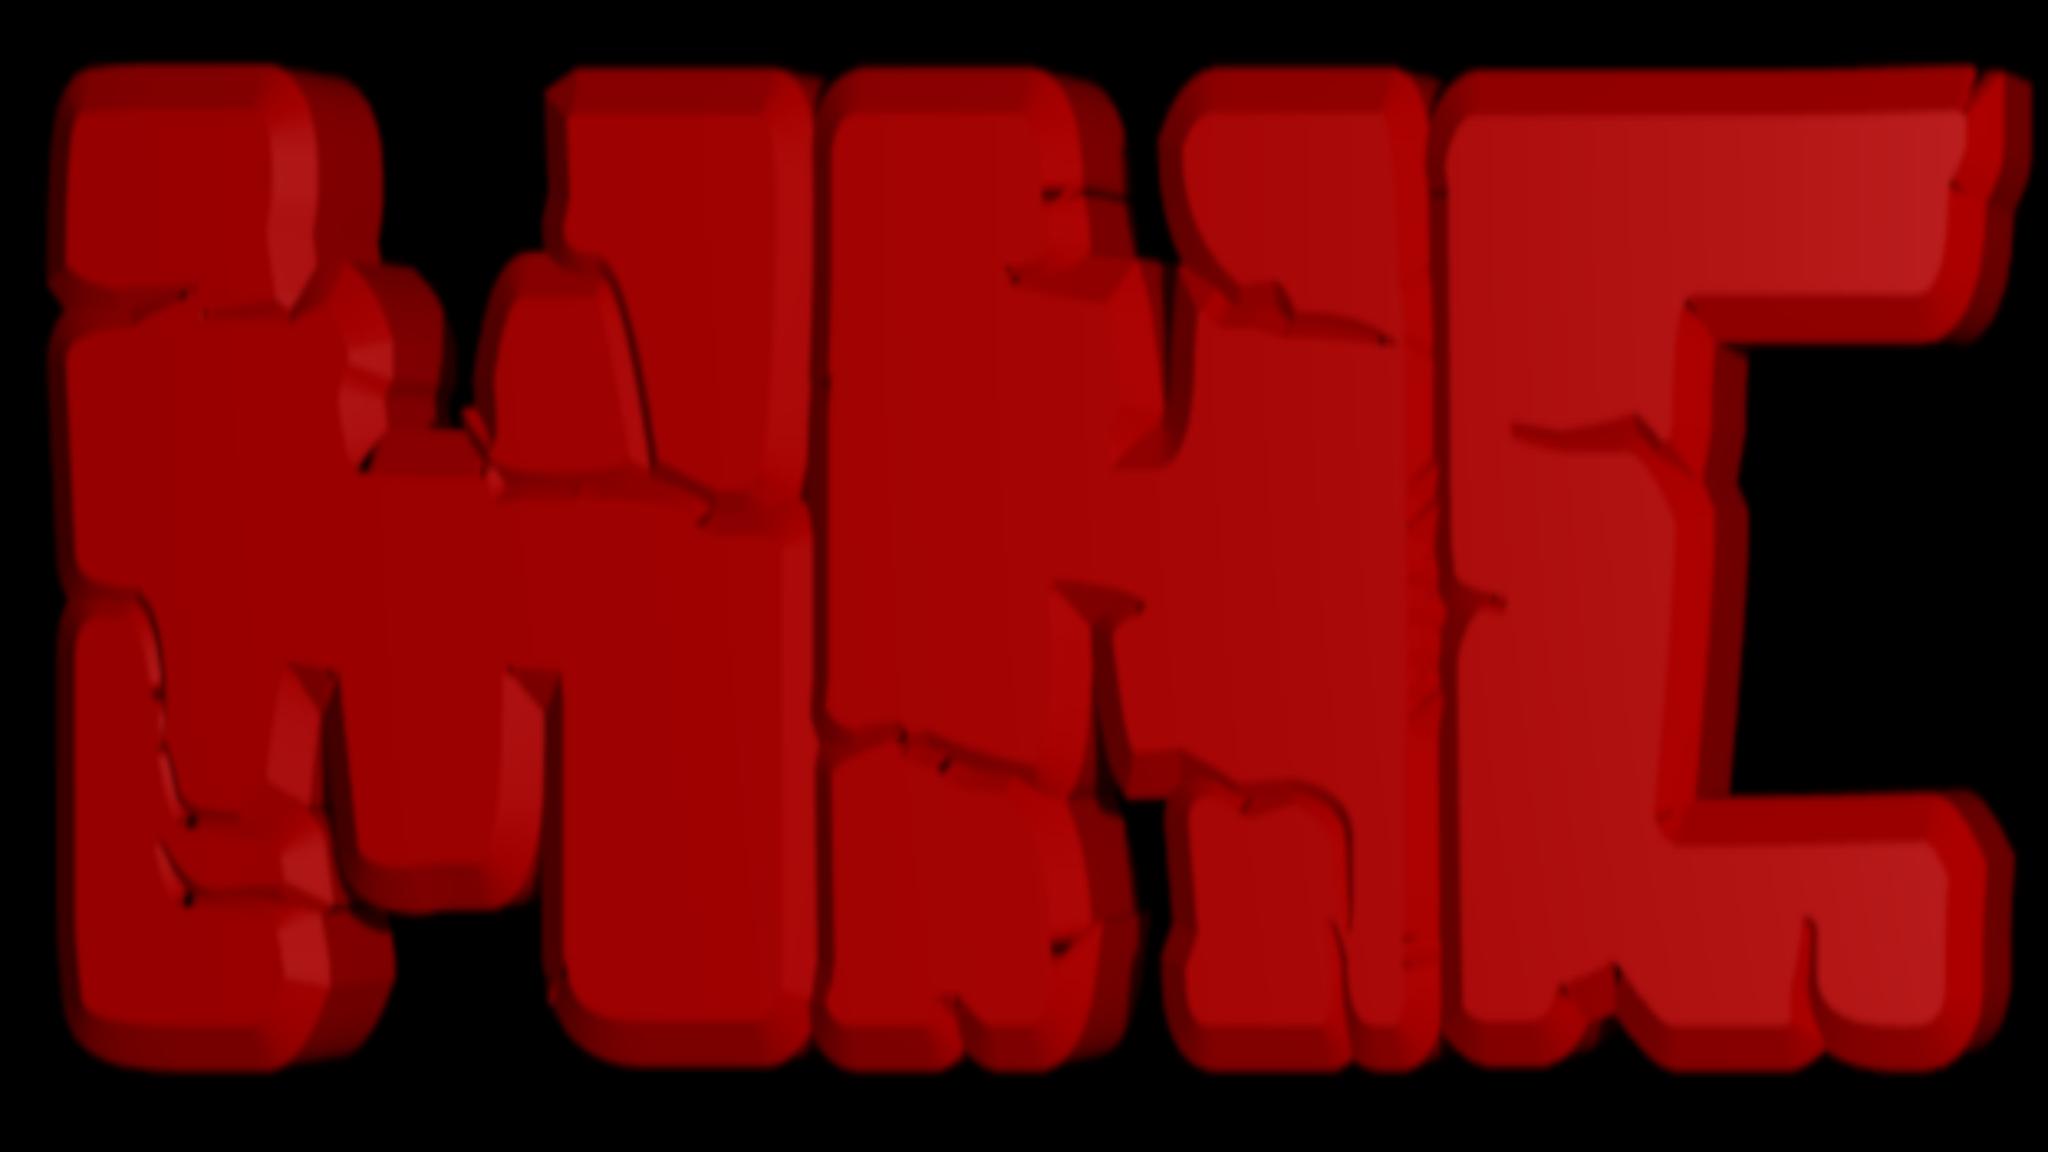 регистрация домена sb